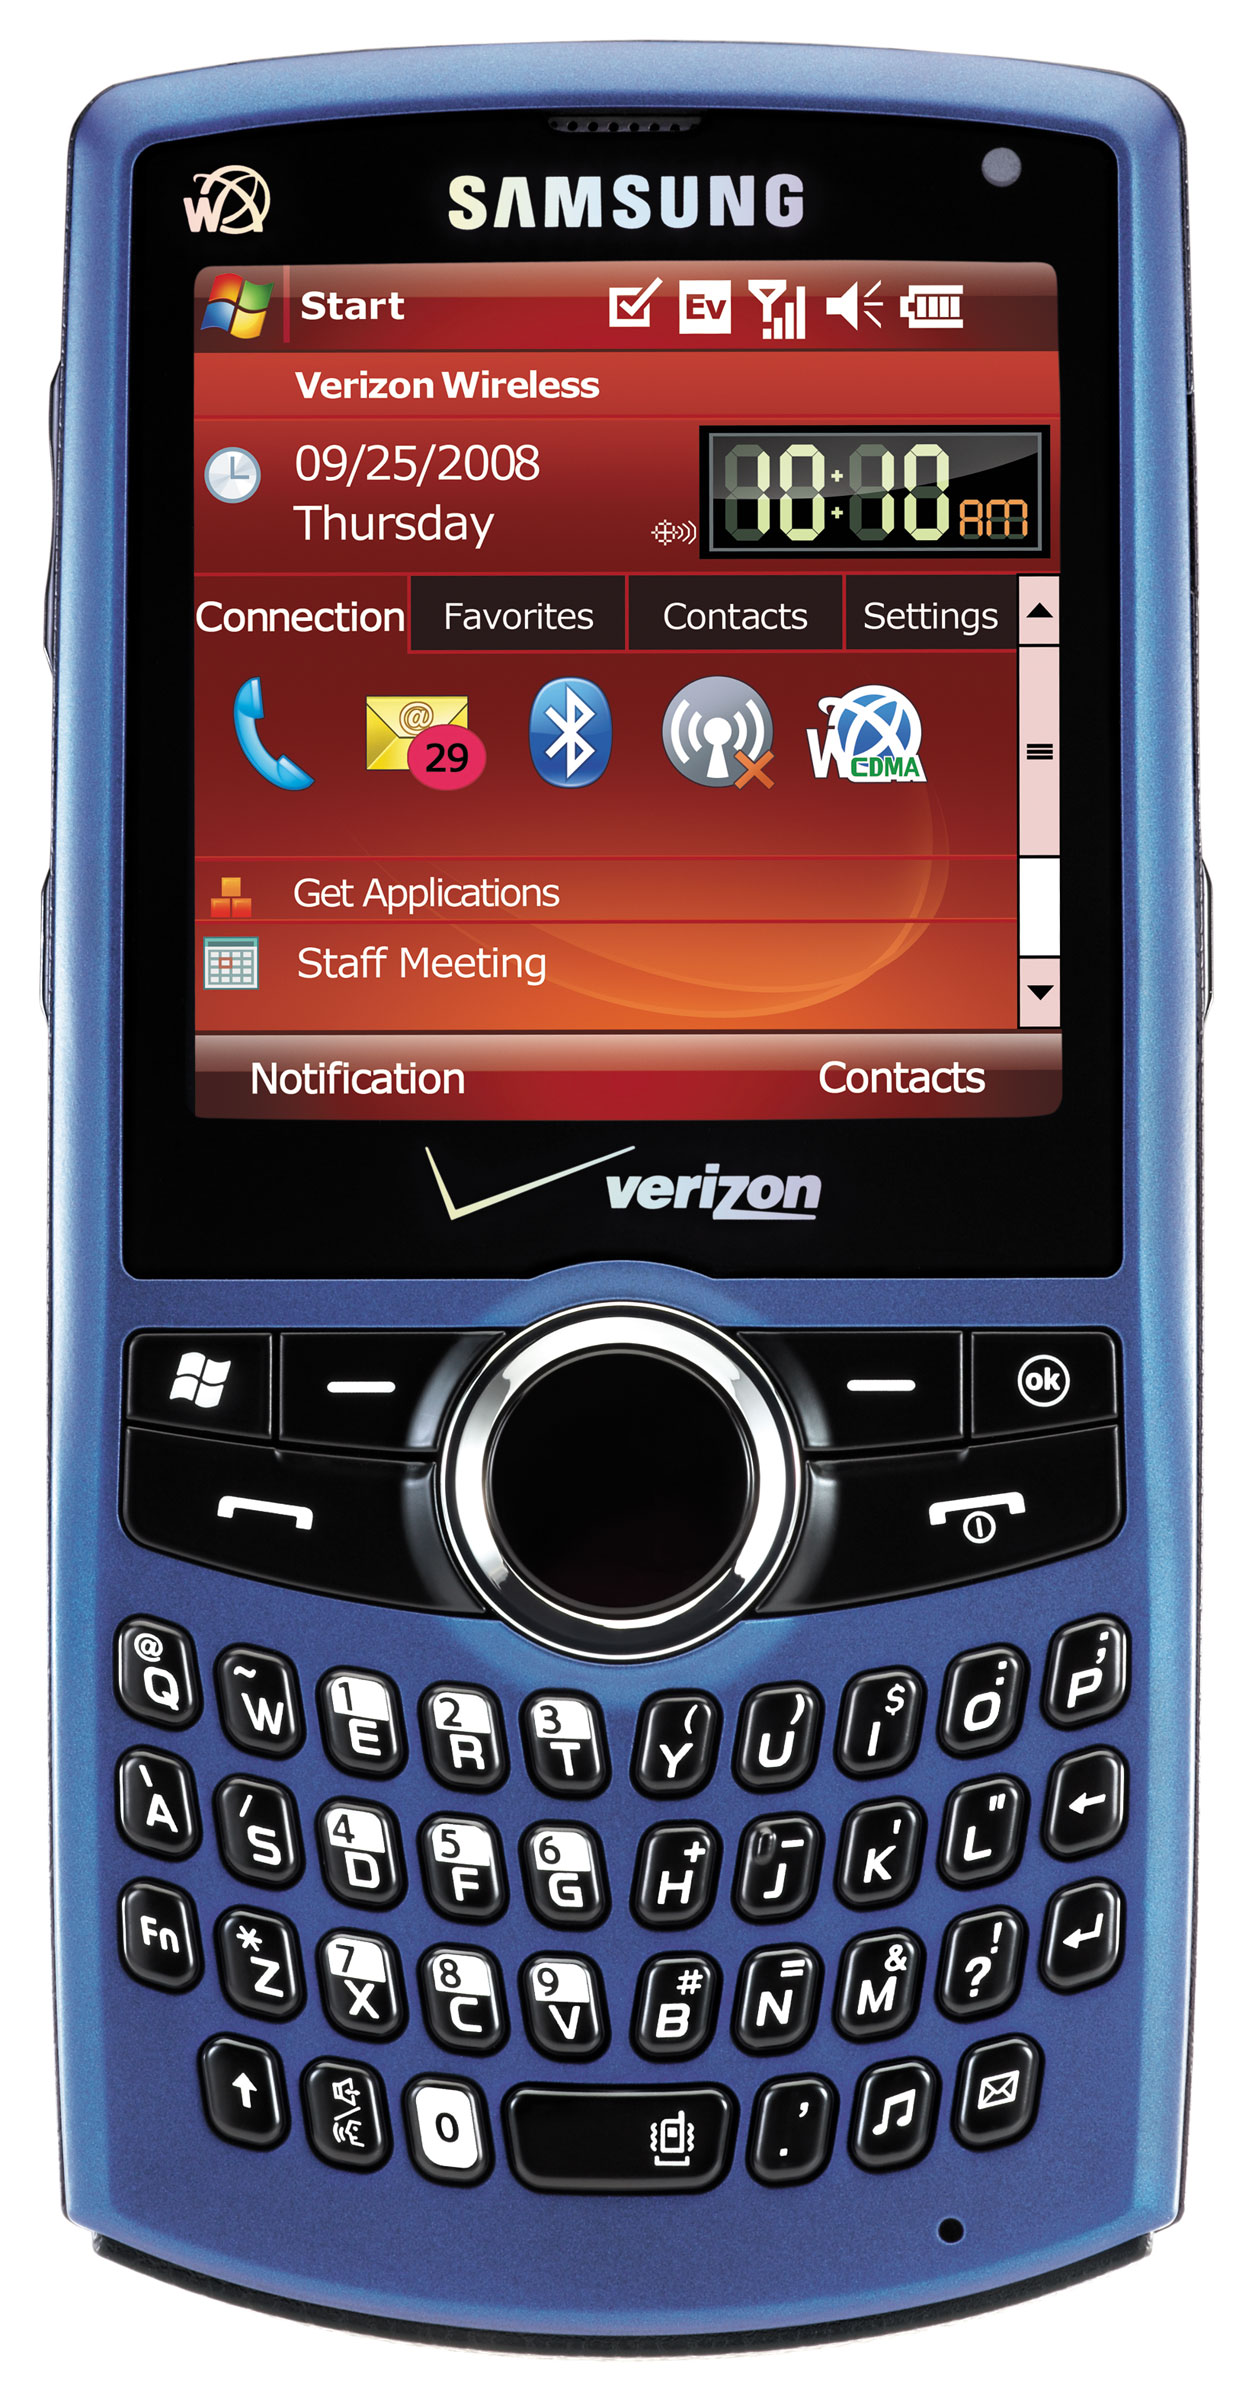 Samsung i770 Saga Price in Philippine Peso